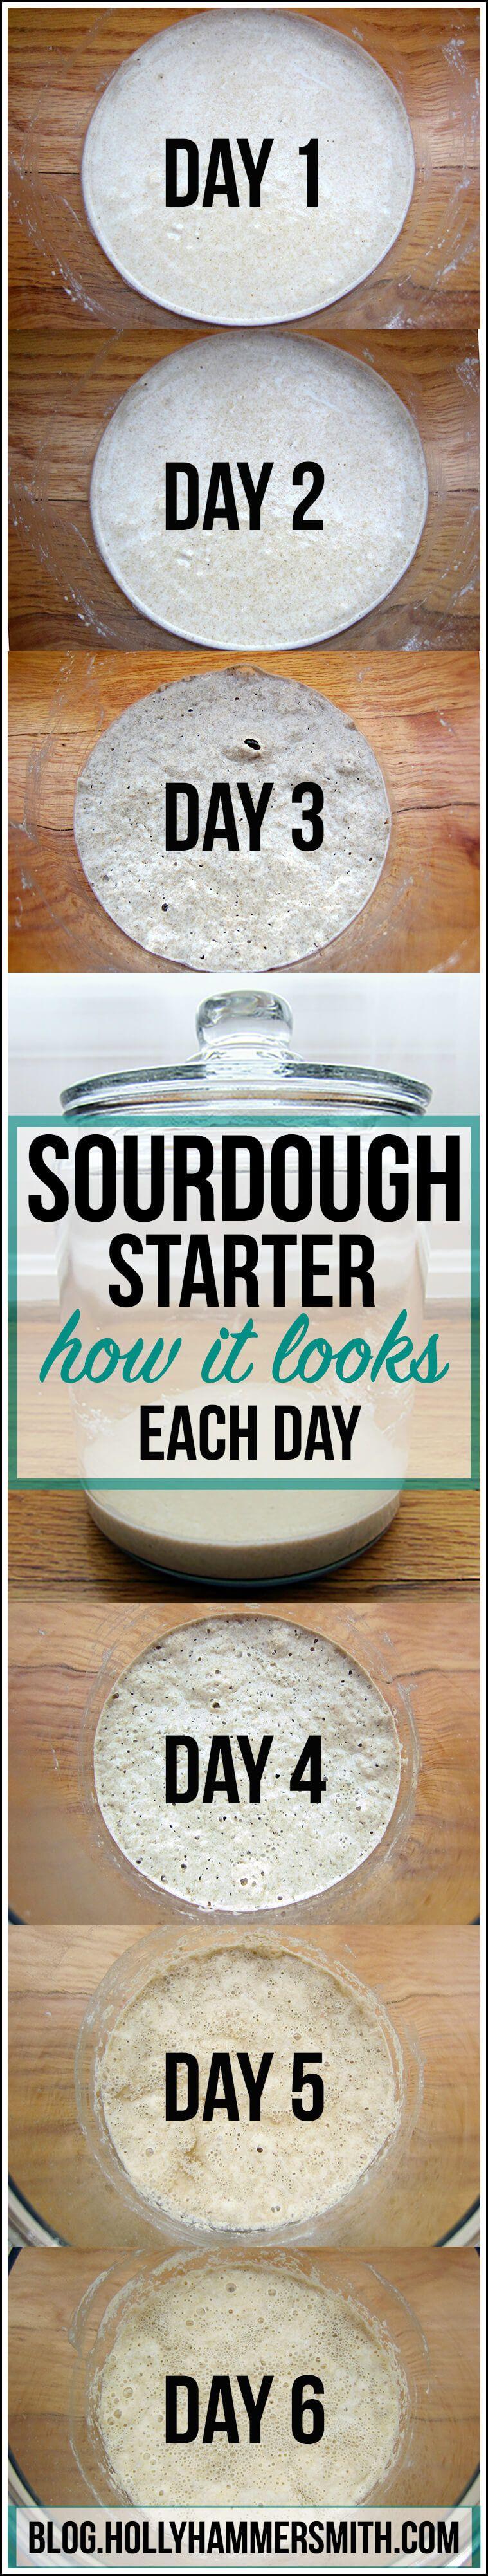 Sourdough Starter Day by Day How it Looks Bread starter